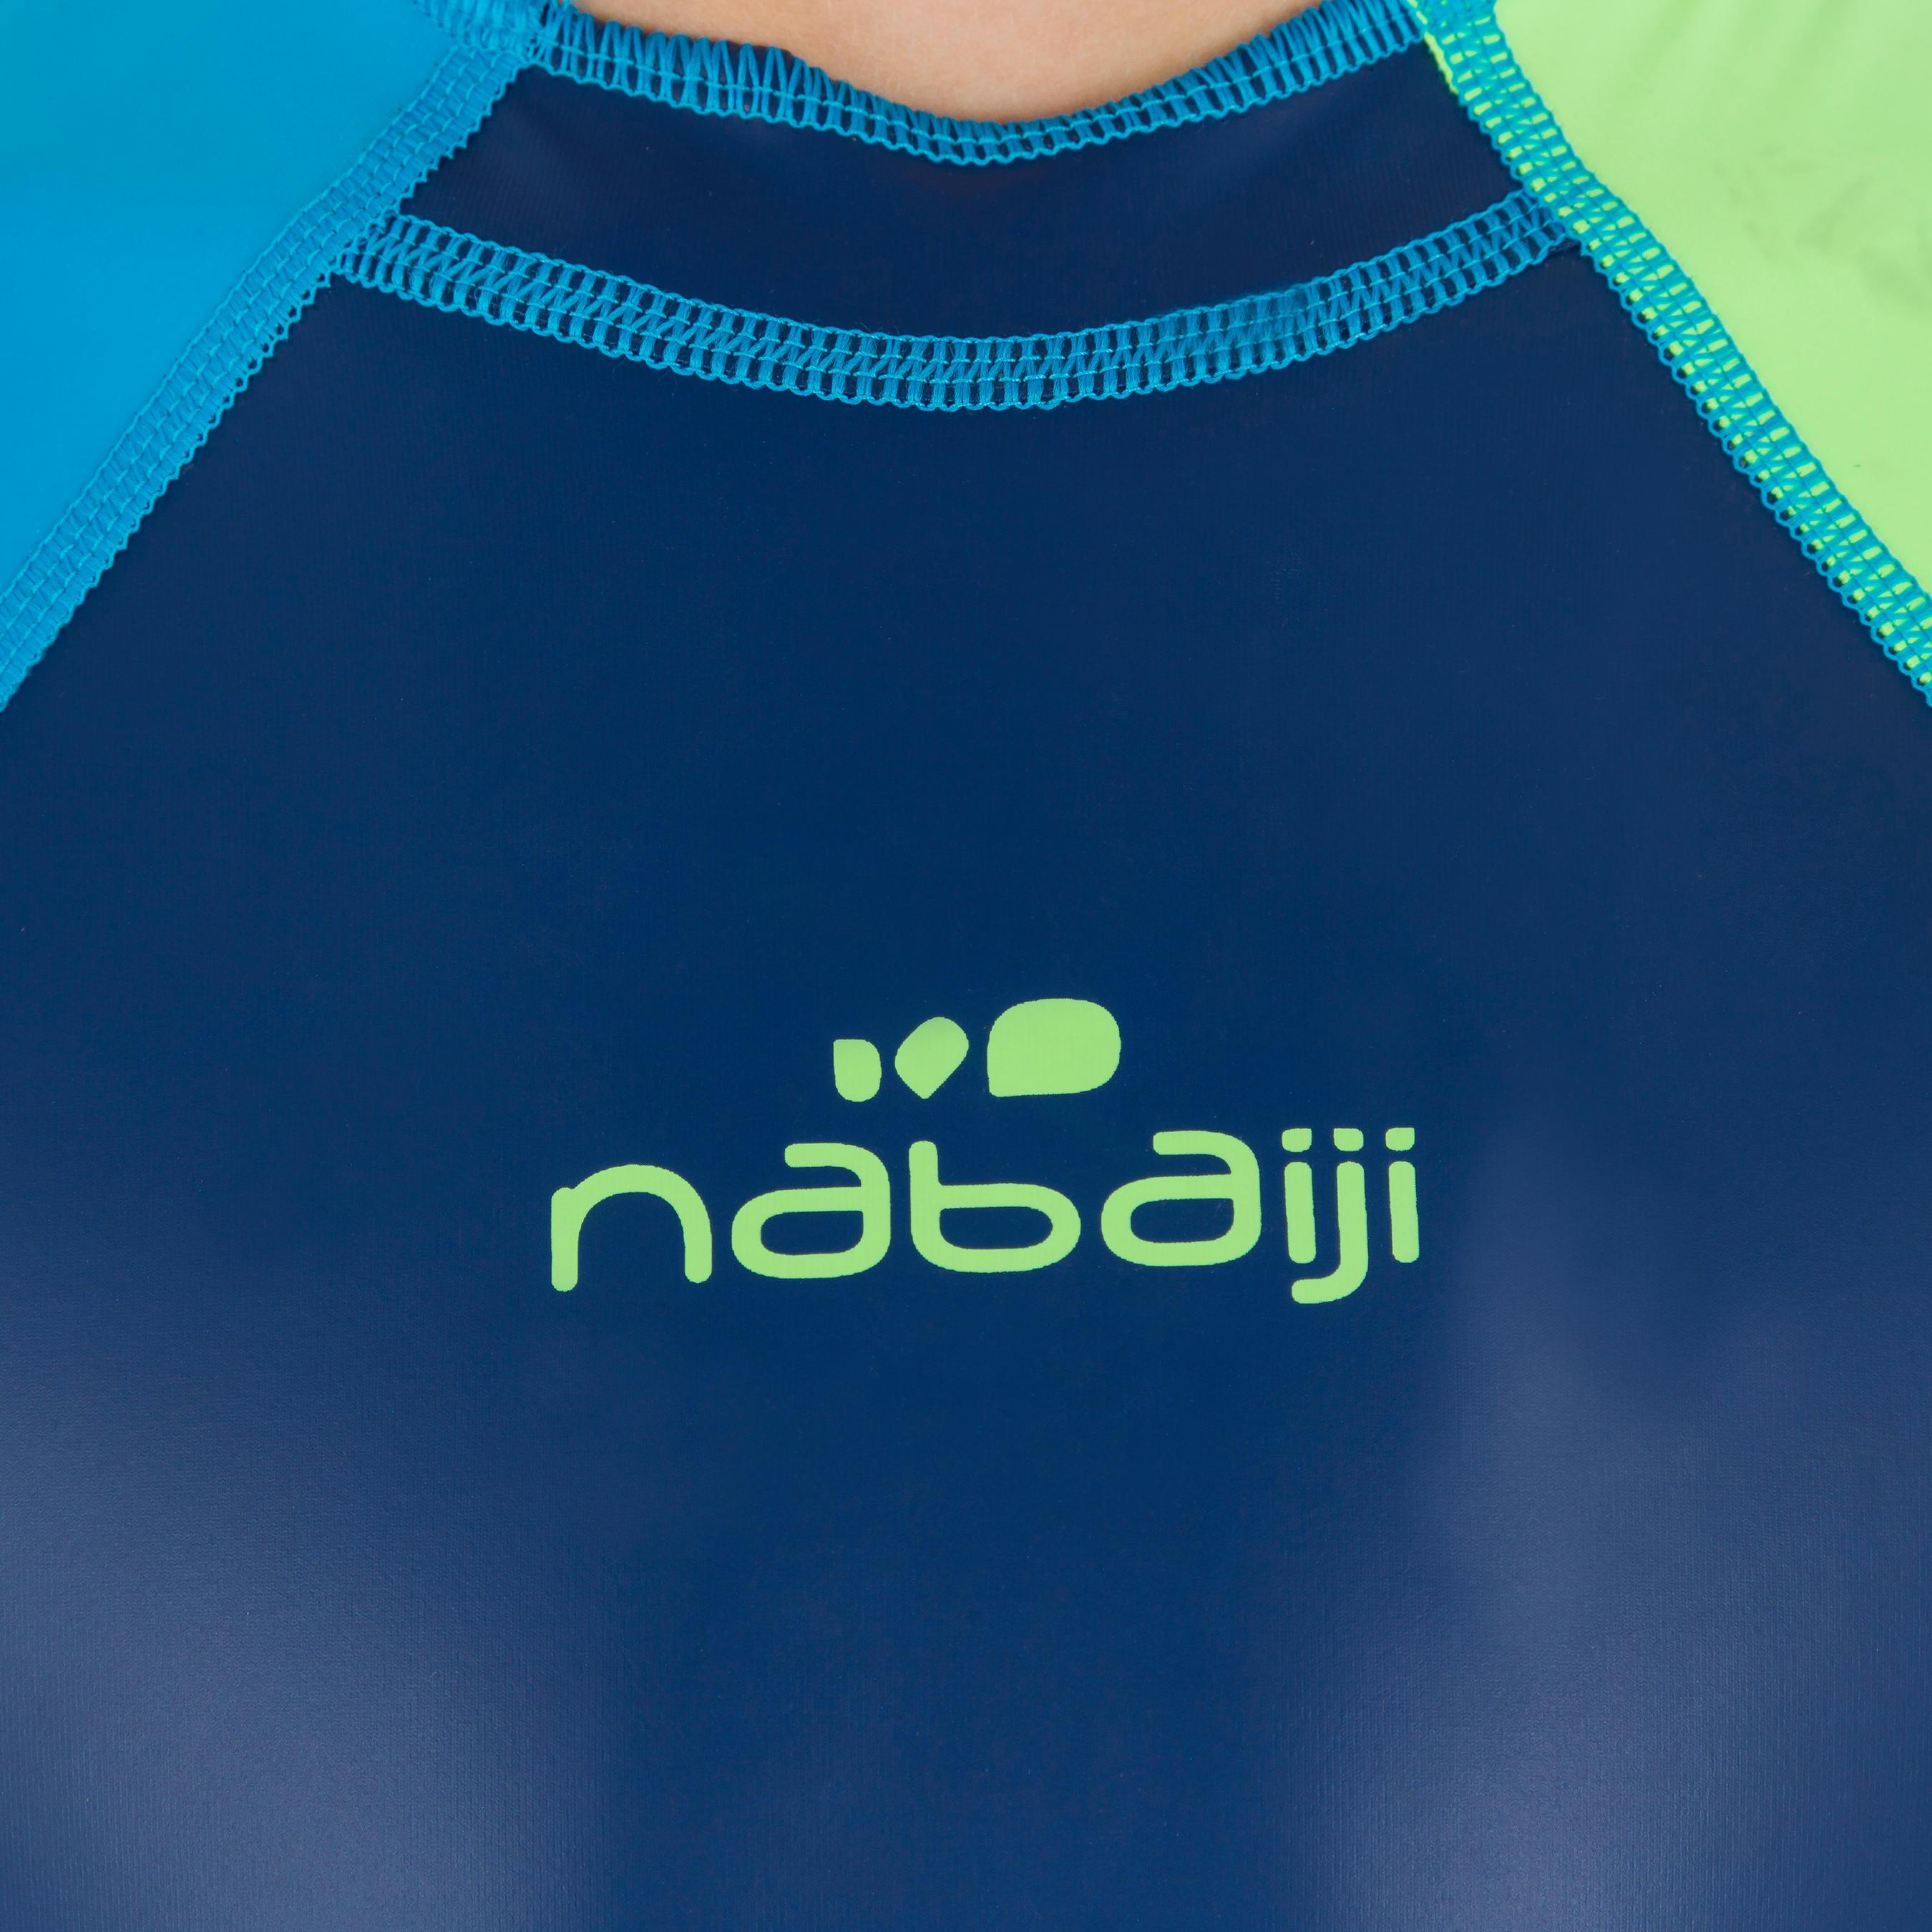 dc838c7d5f38 Traje acuático para natación kloupi azul verde - Decathlon